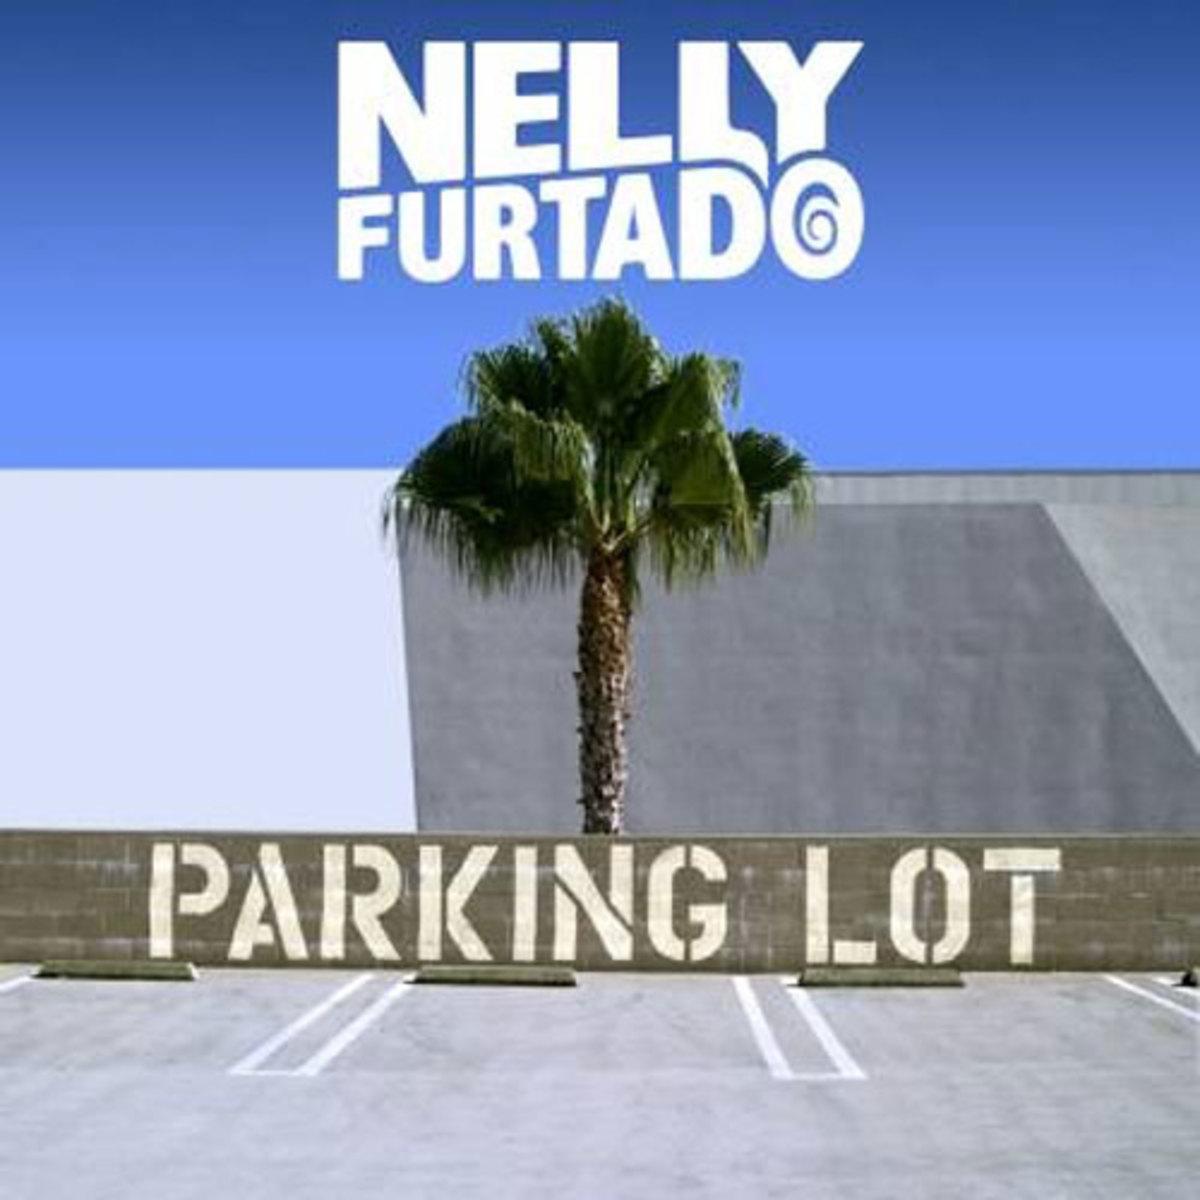 nellyfurtado-parking.jpg